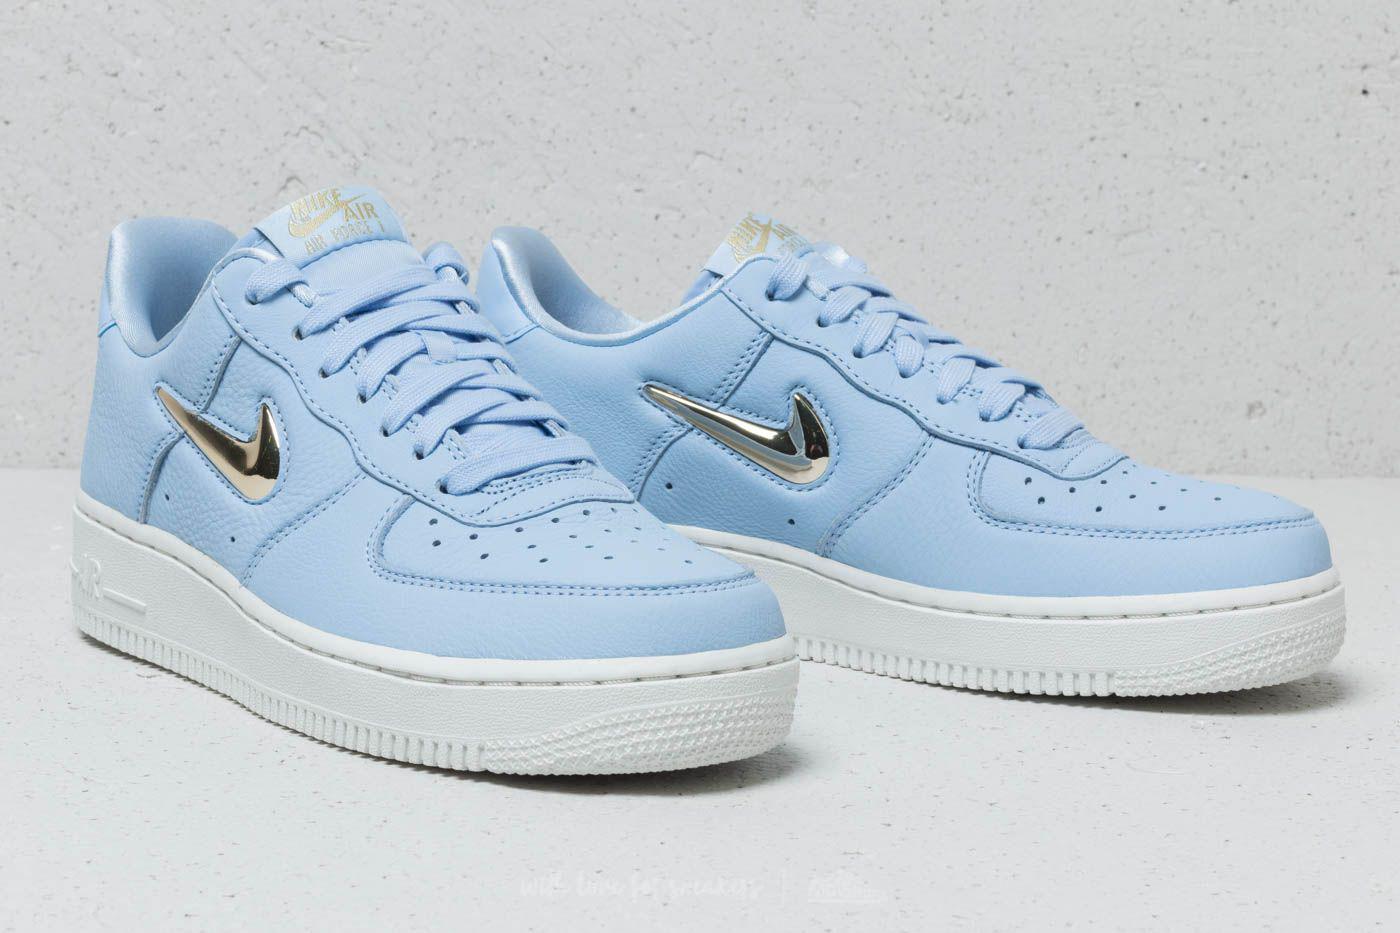 Nike Blue Wmns Air Force 1 '07 Premium Lx Royal Tint Mtlc Gold Star